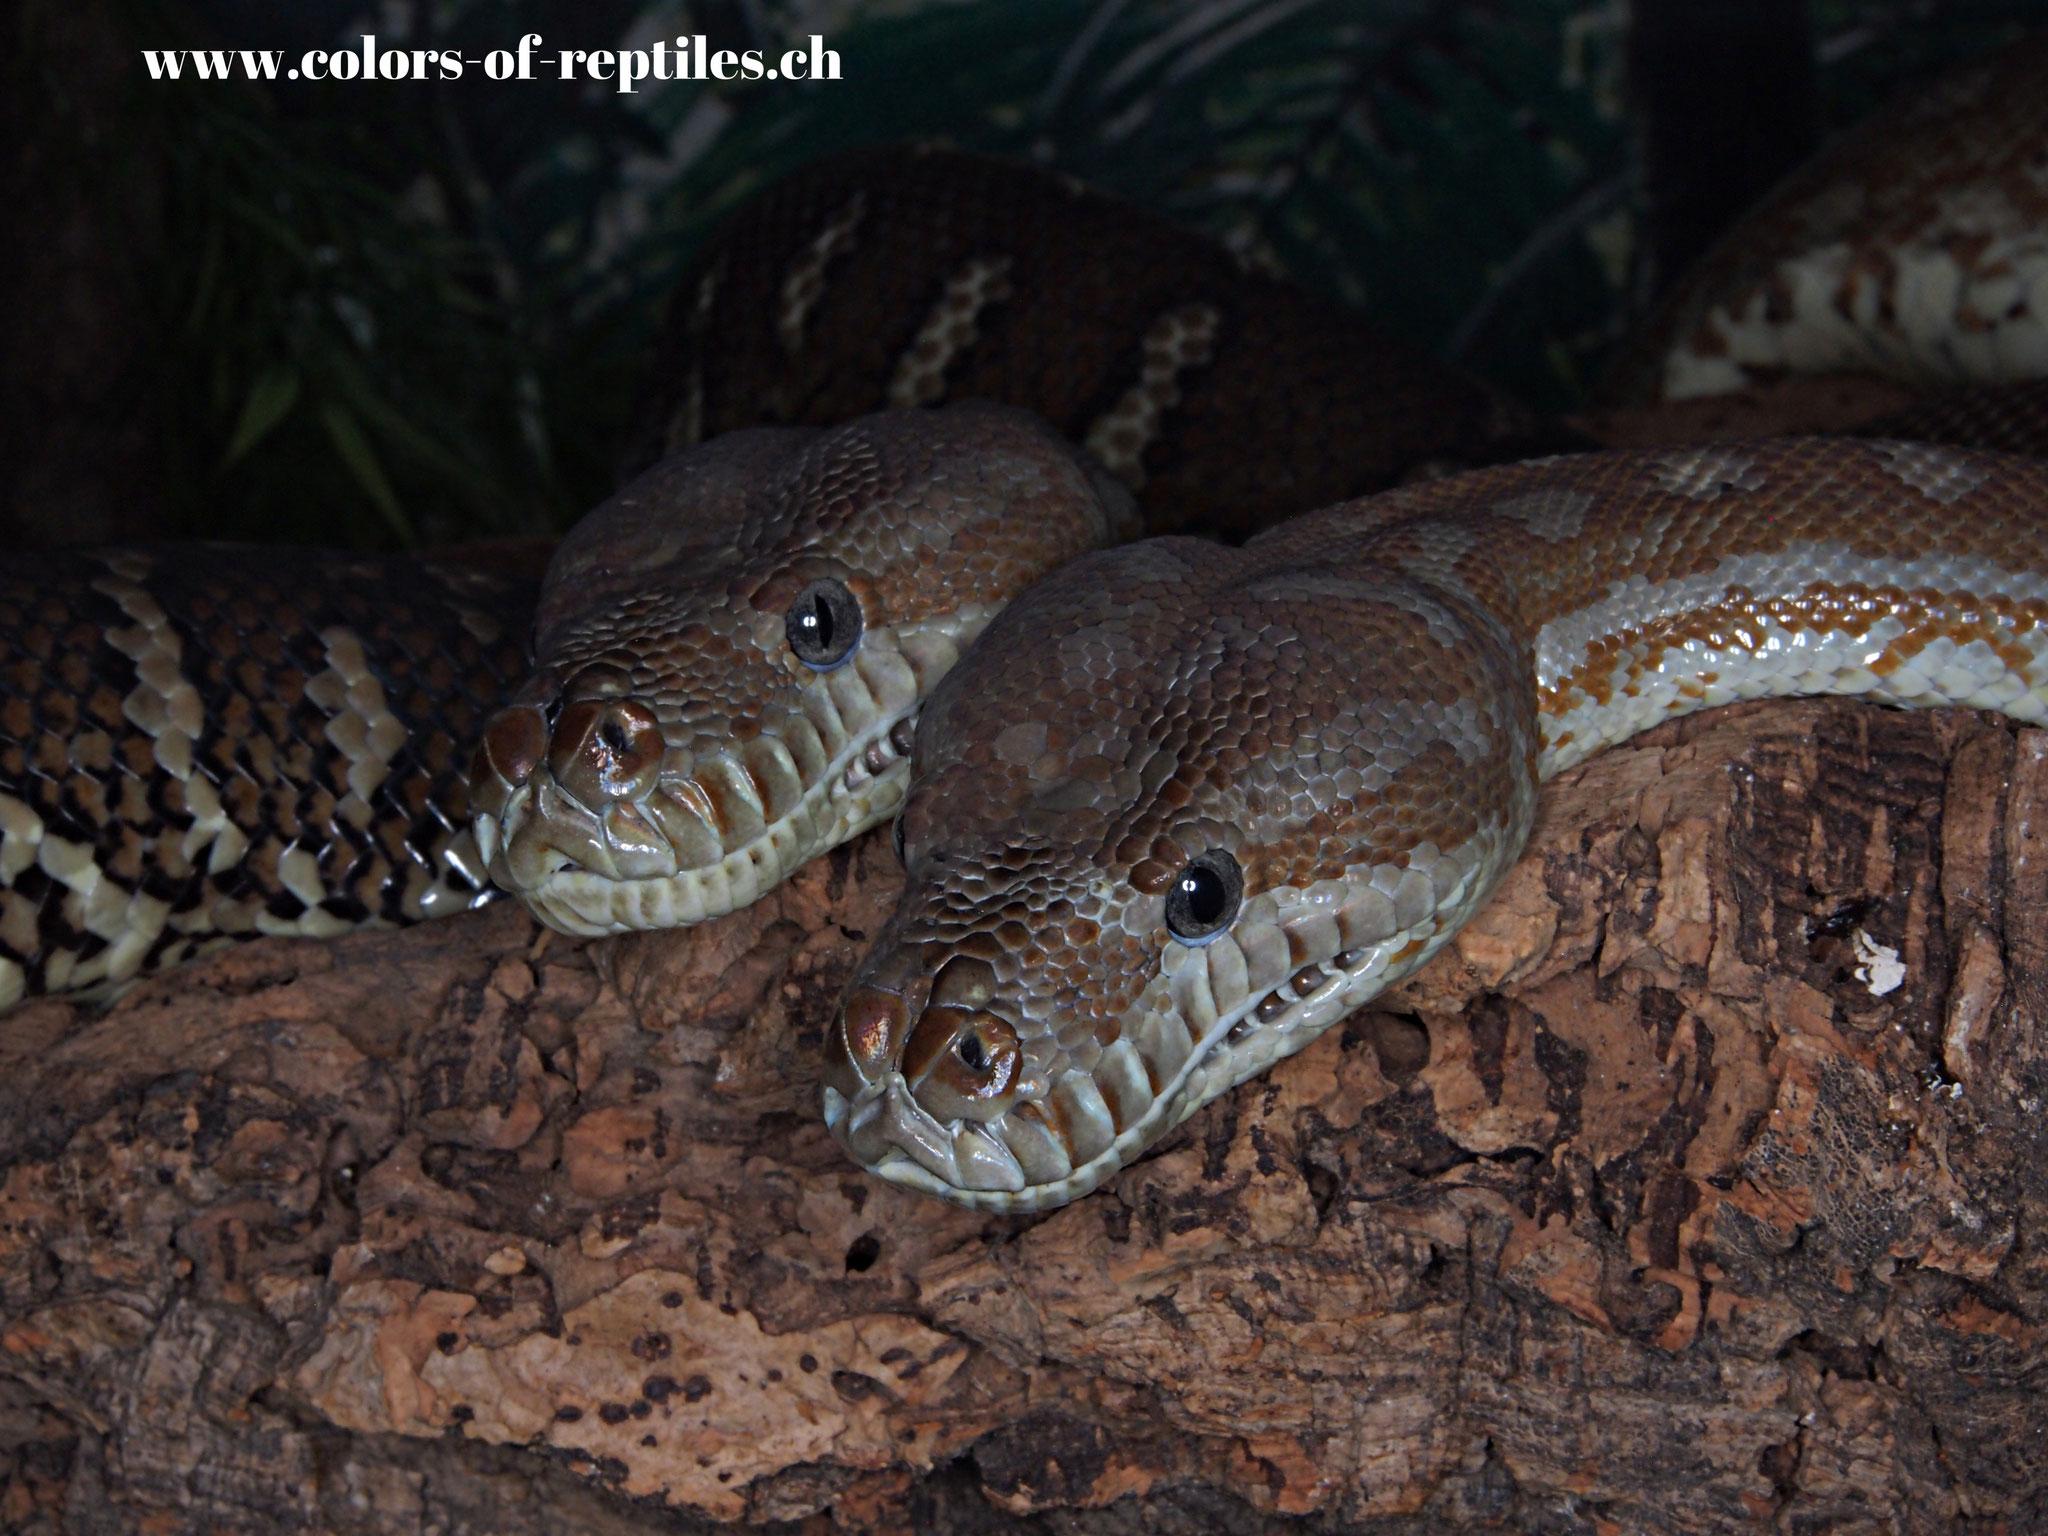 Zentralaustralischer Python - Morelia bredli